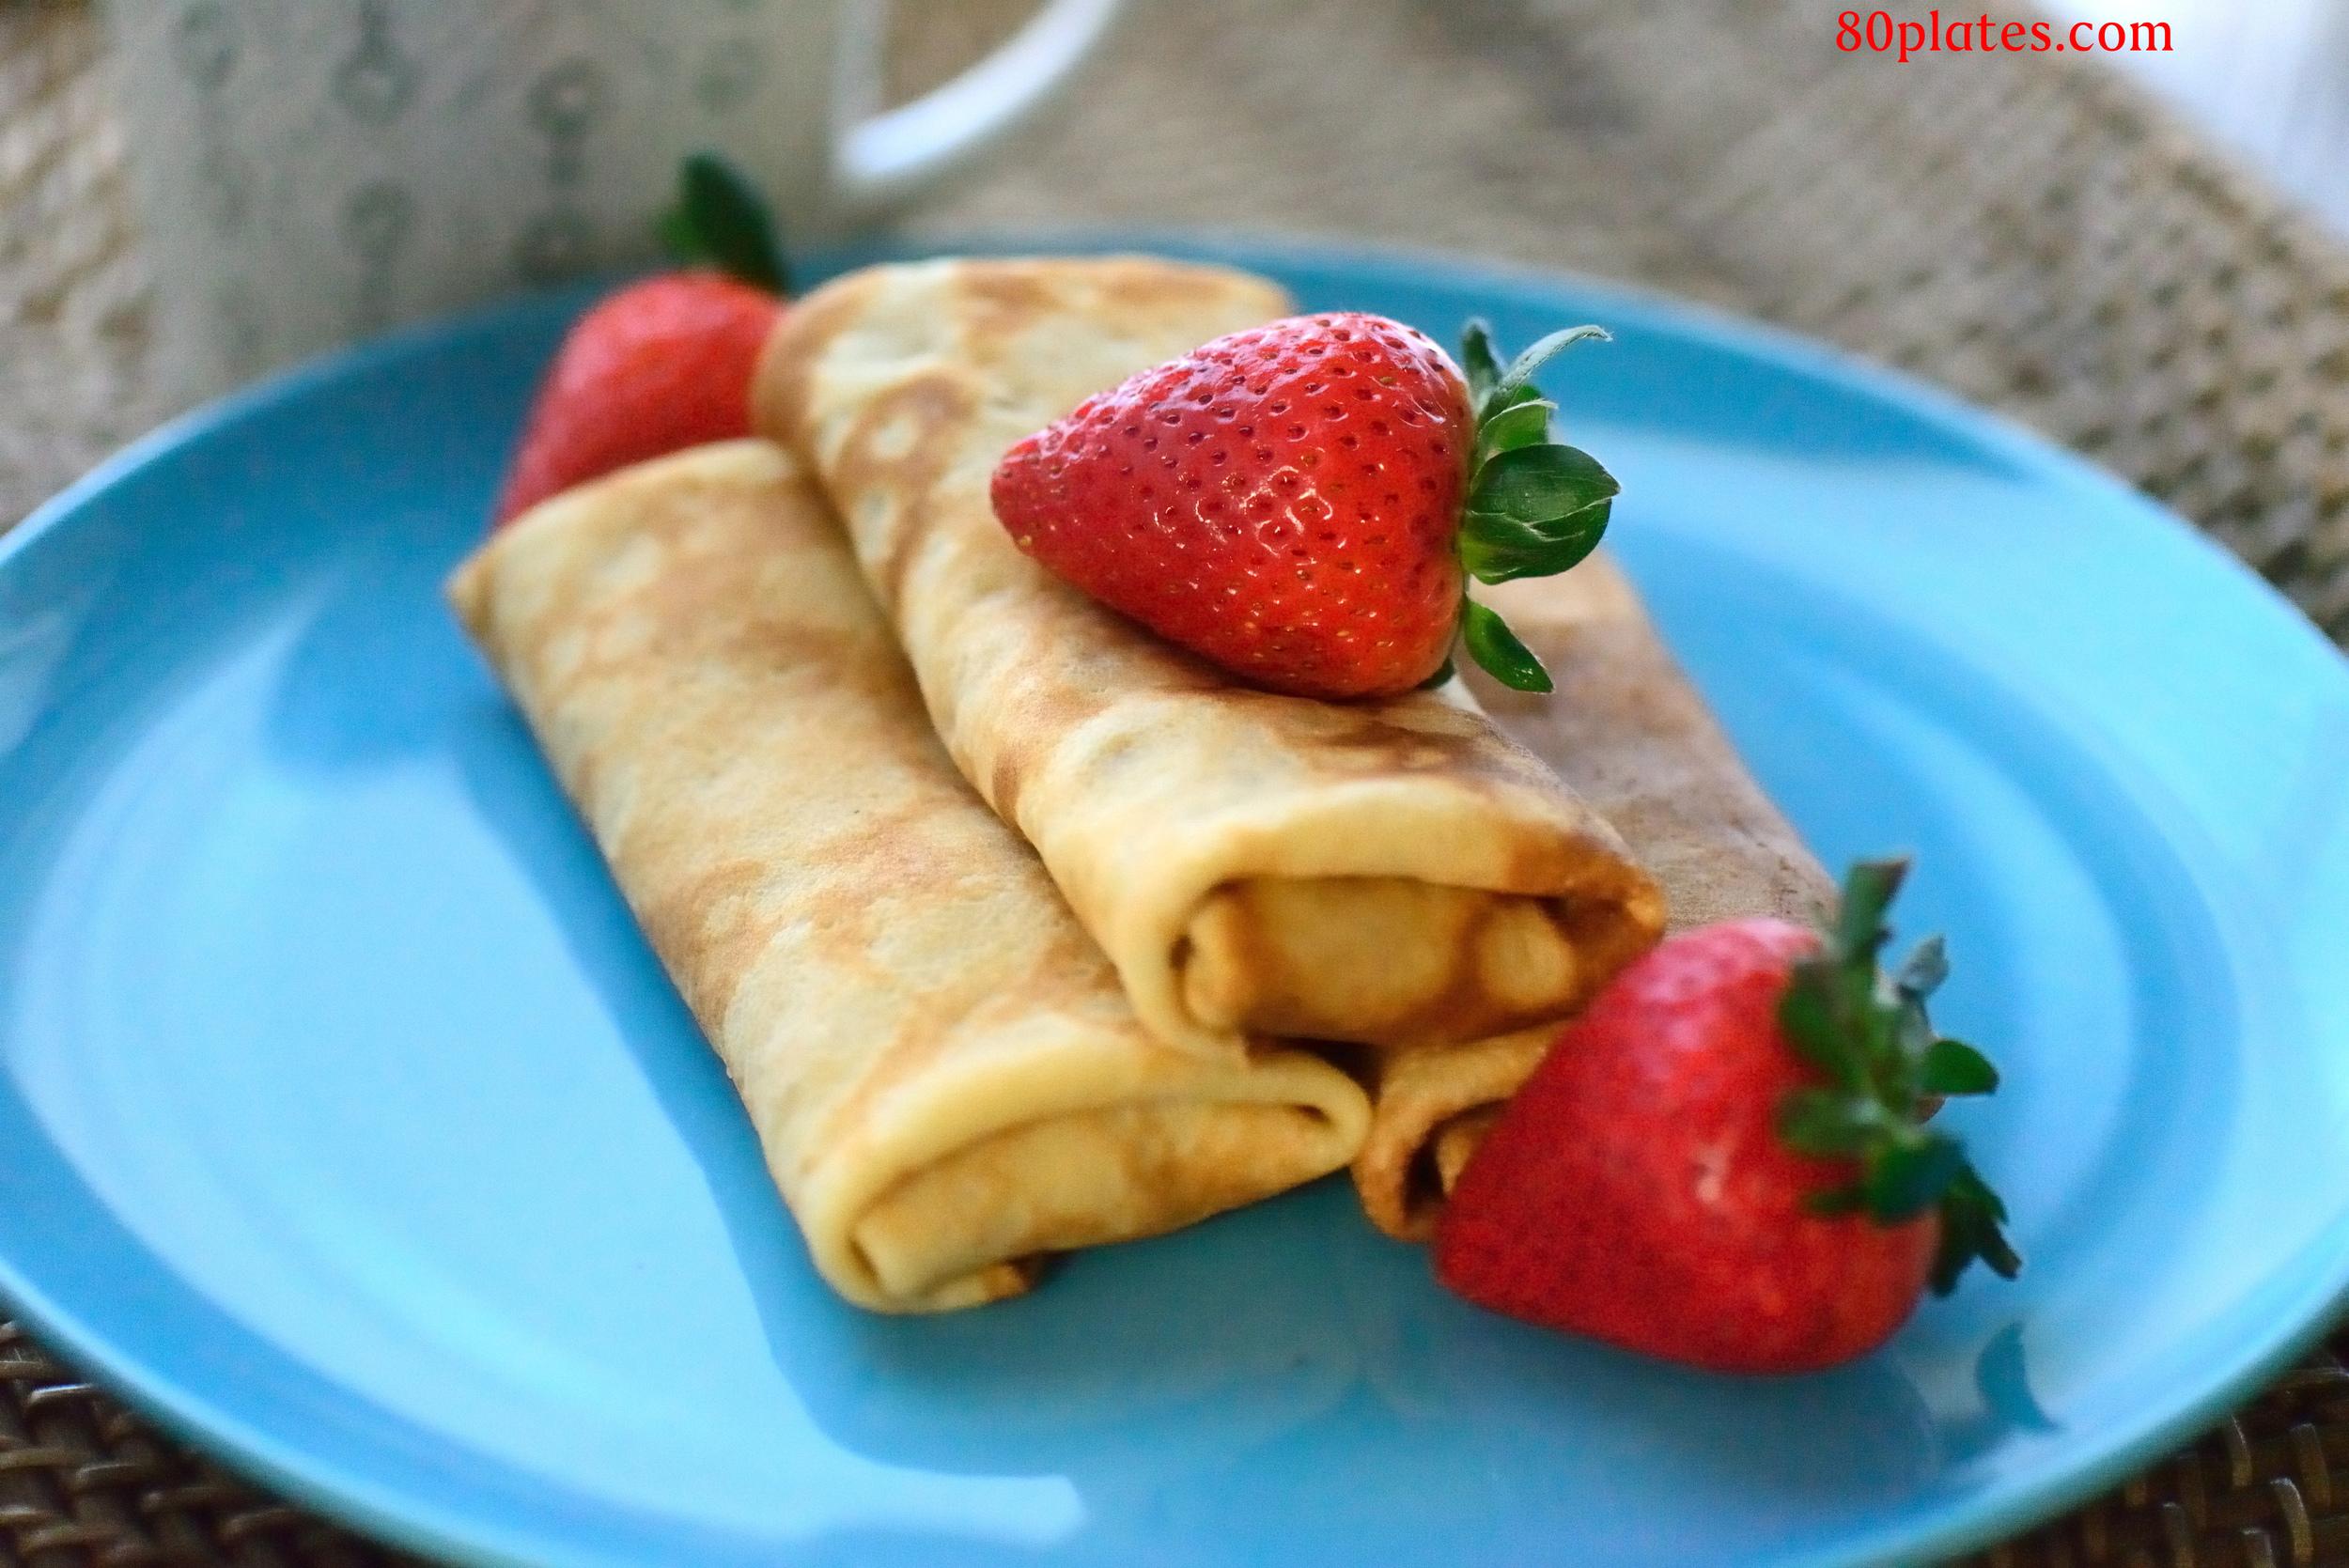 Enjoy this tasty treat!